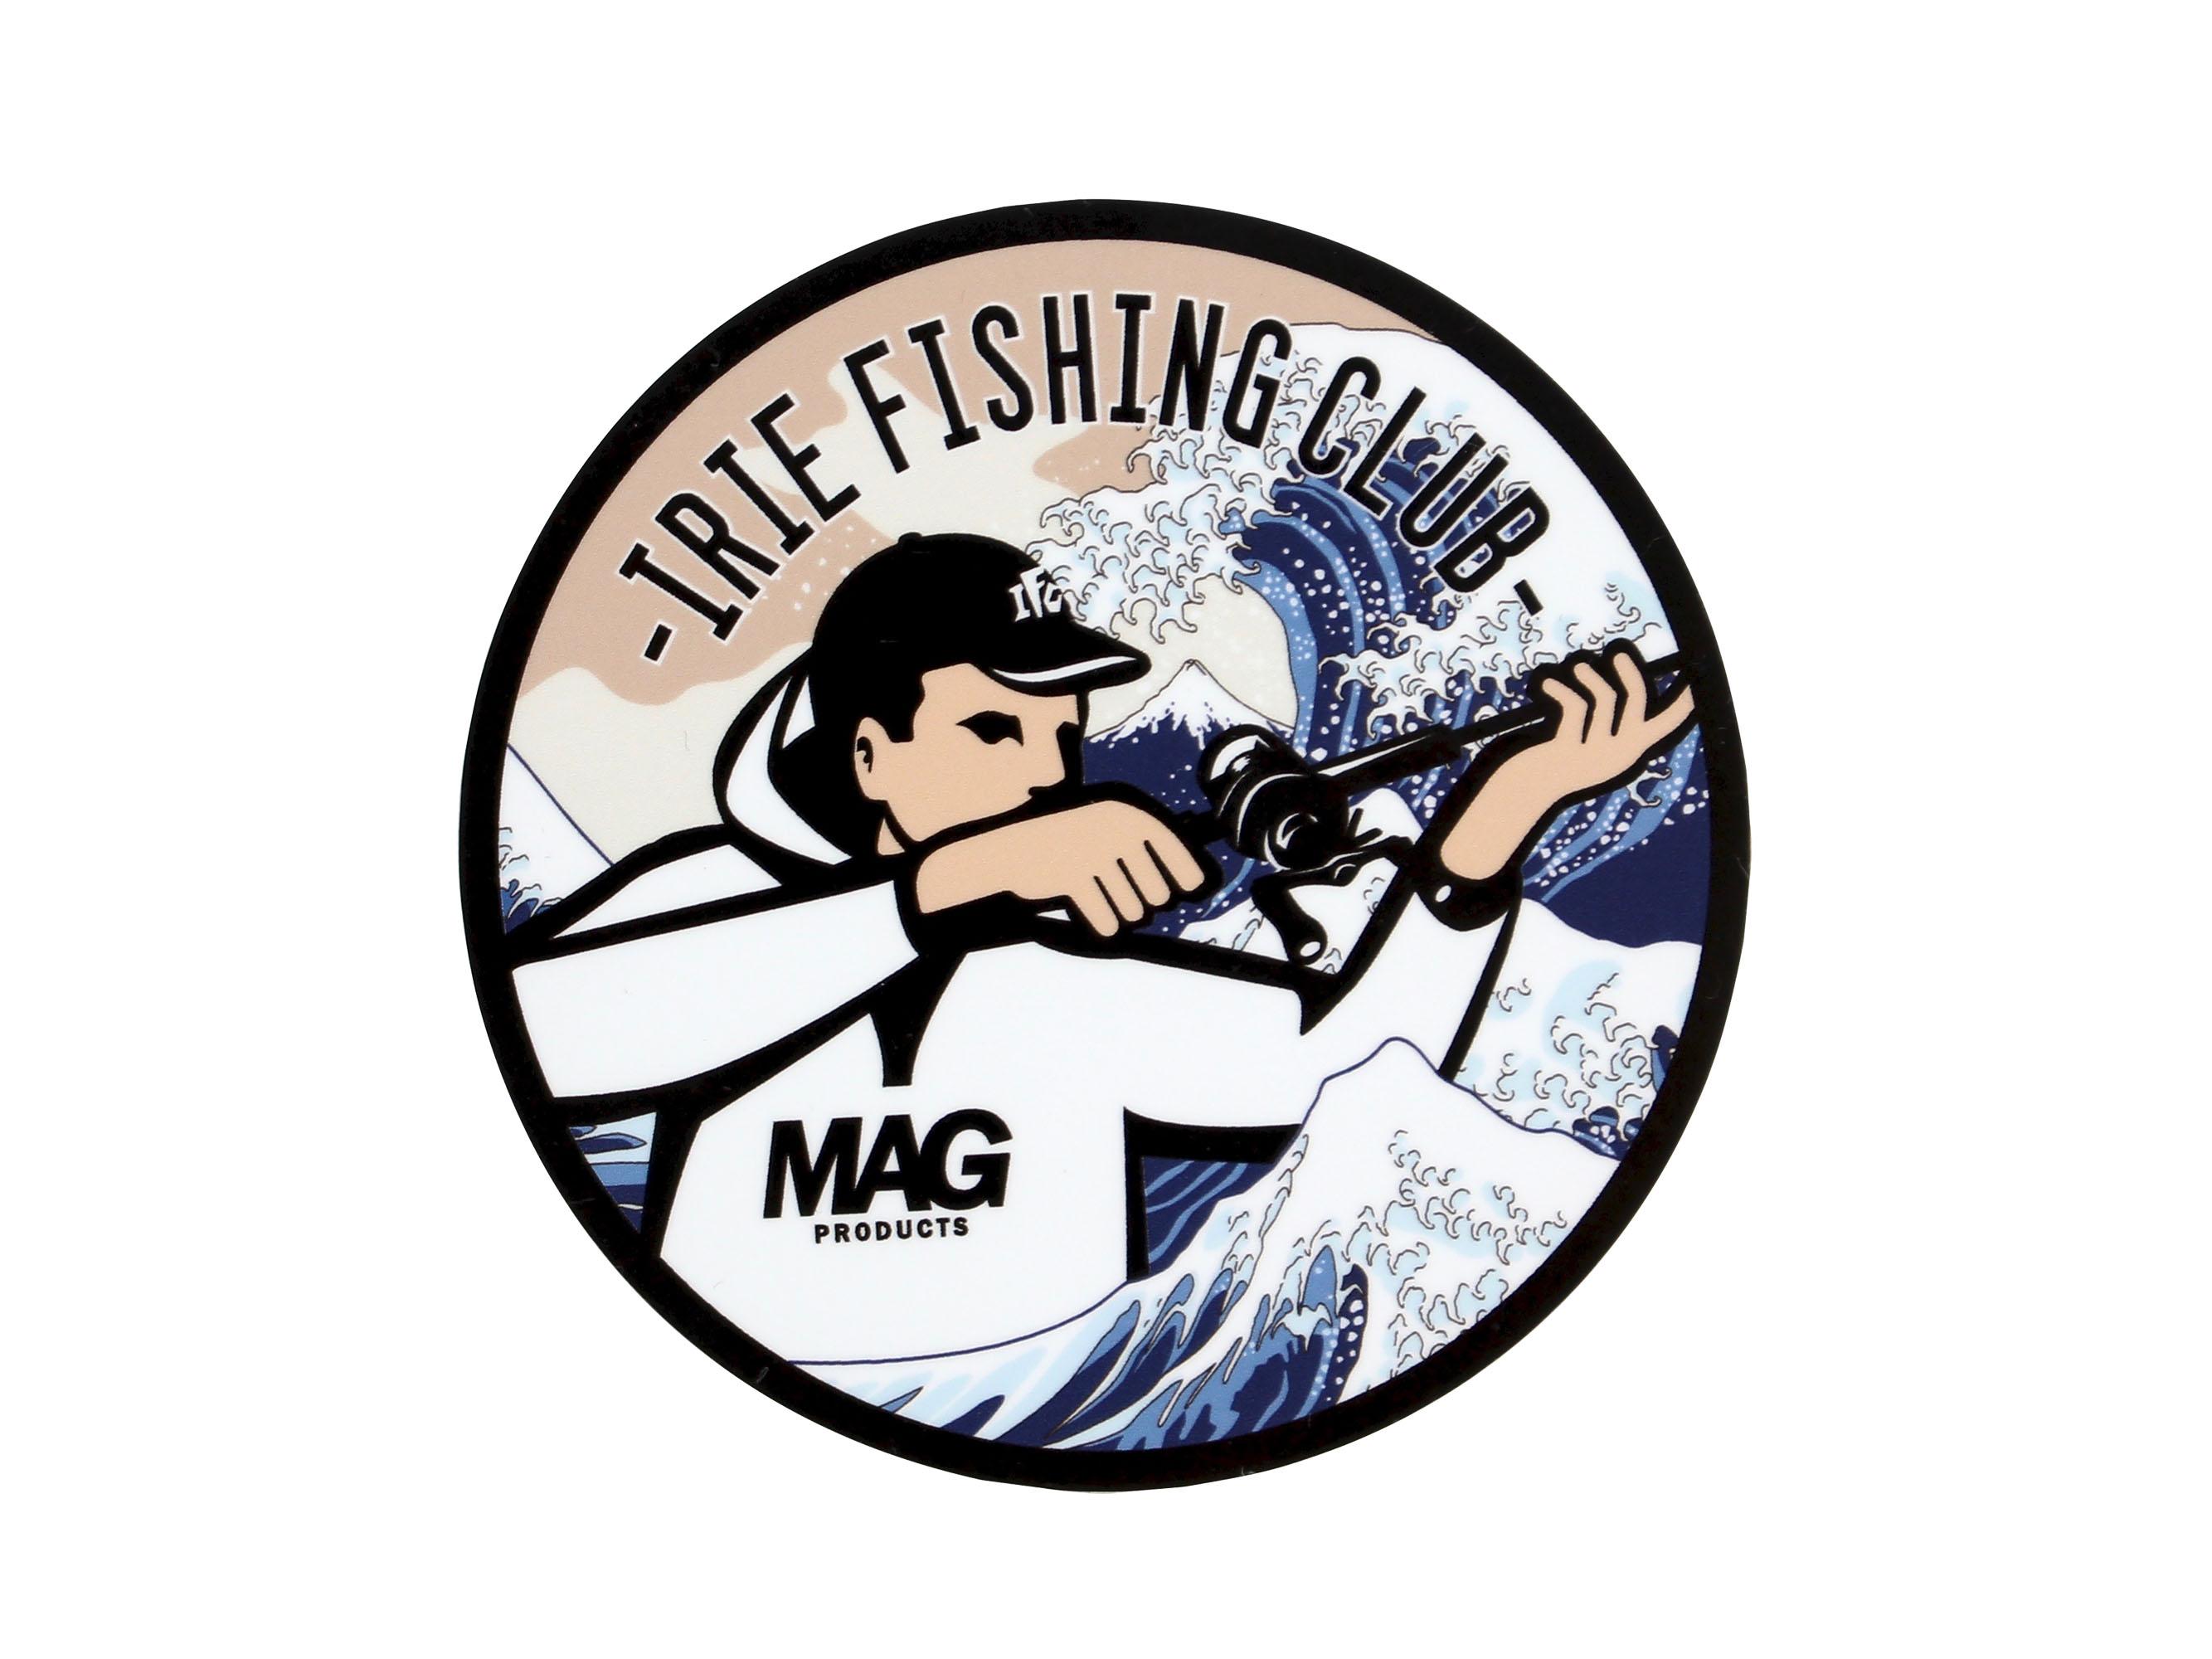 ×MAG BITE SNIPER BOY WATER PROOF STICKER【HOKUSAI】-IRIE FISHING CLUB-